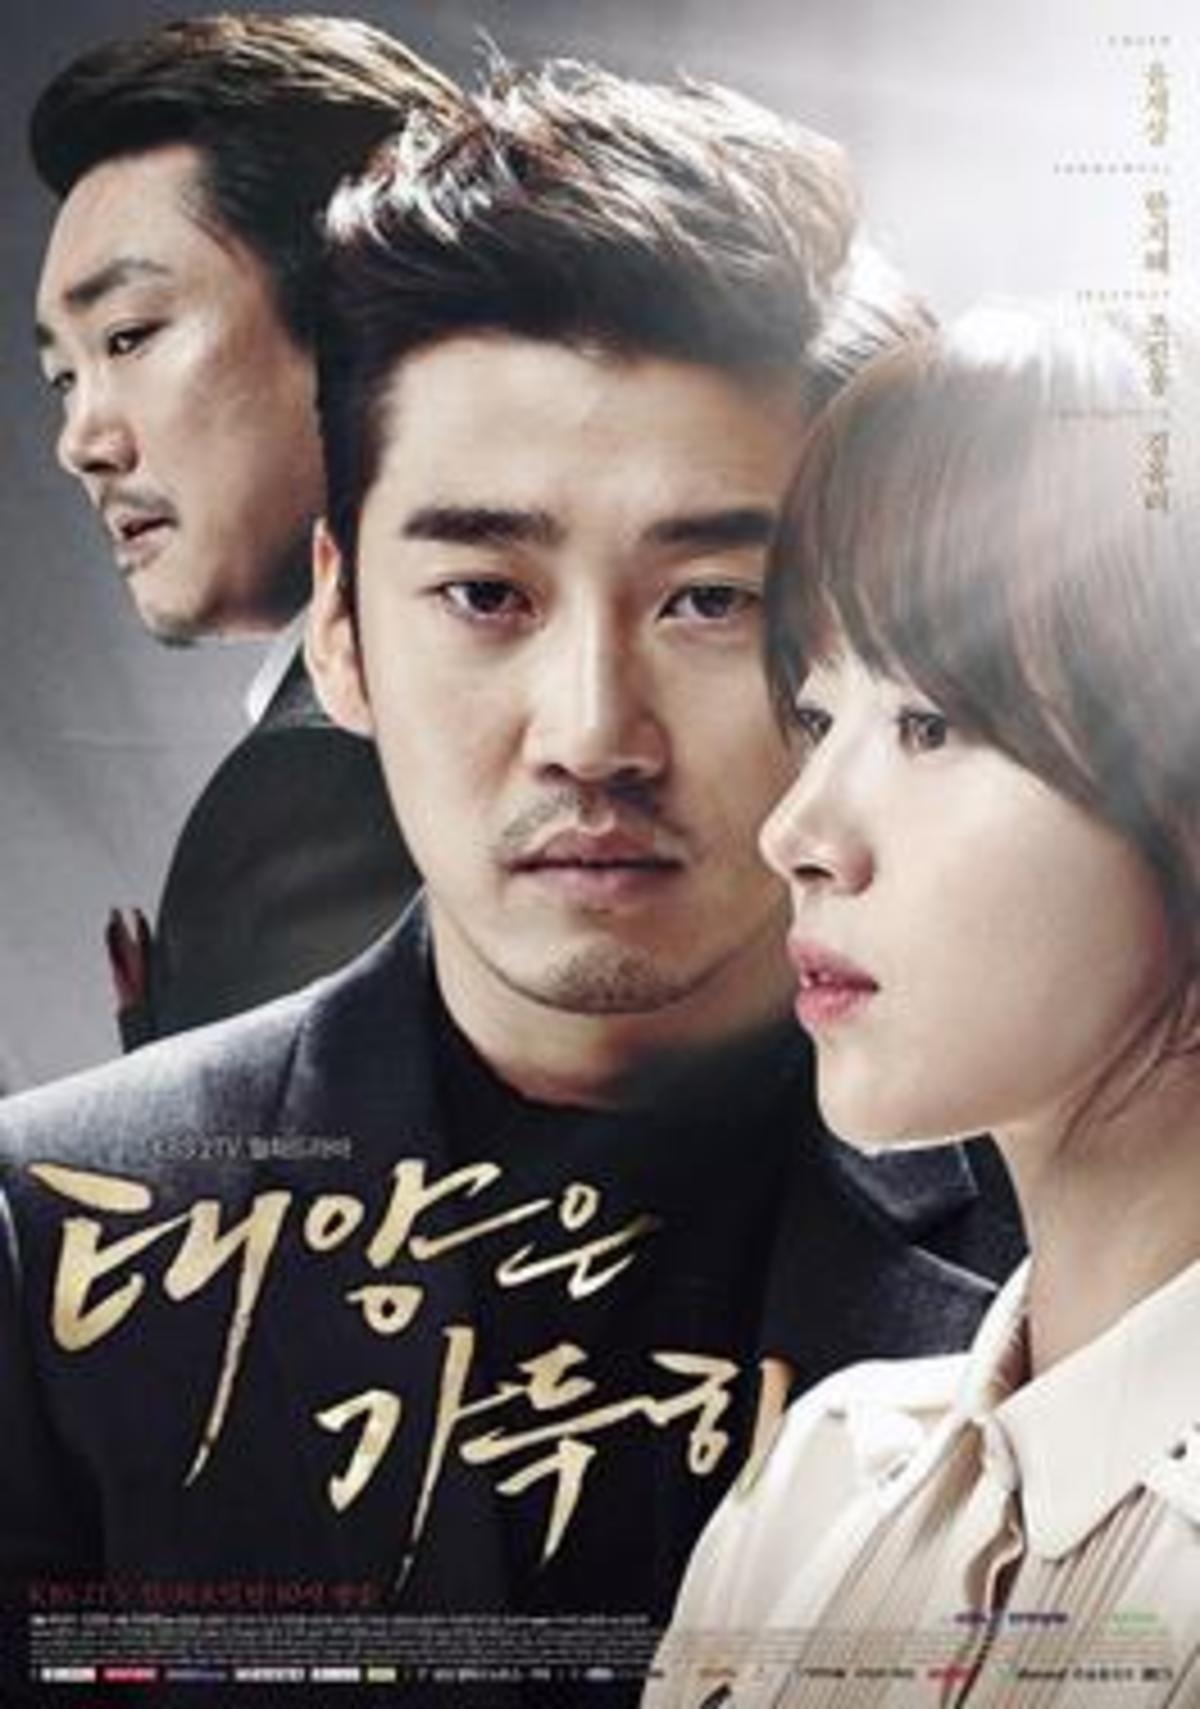 The Full Sun (태양은 가득히) Korean Drama (2014) Starring g.o